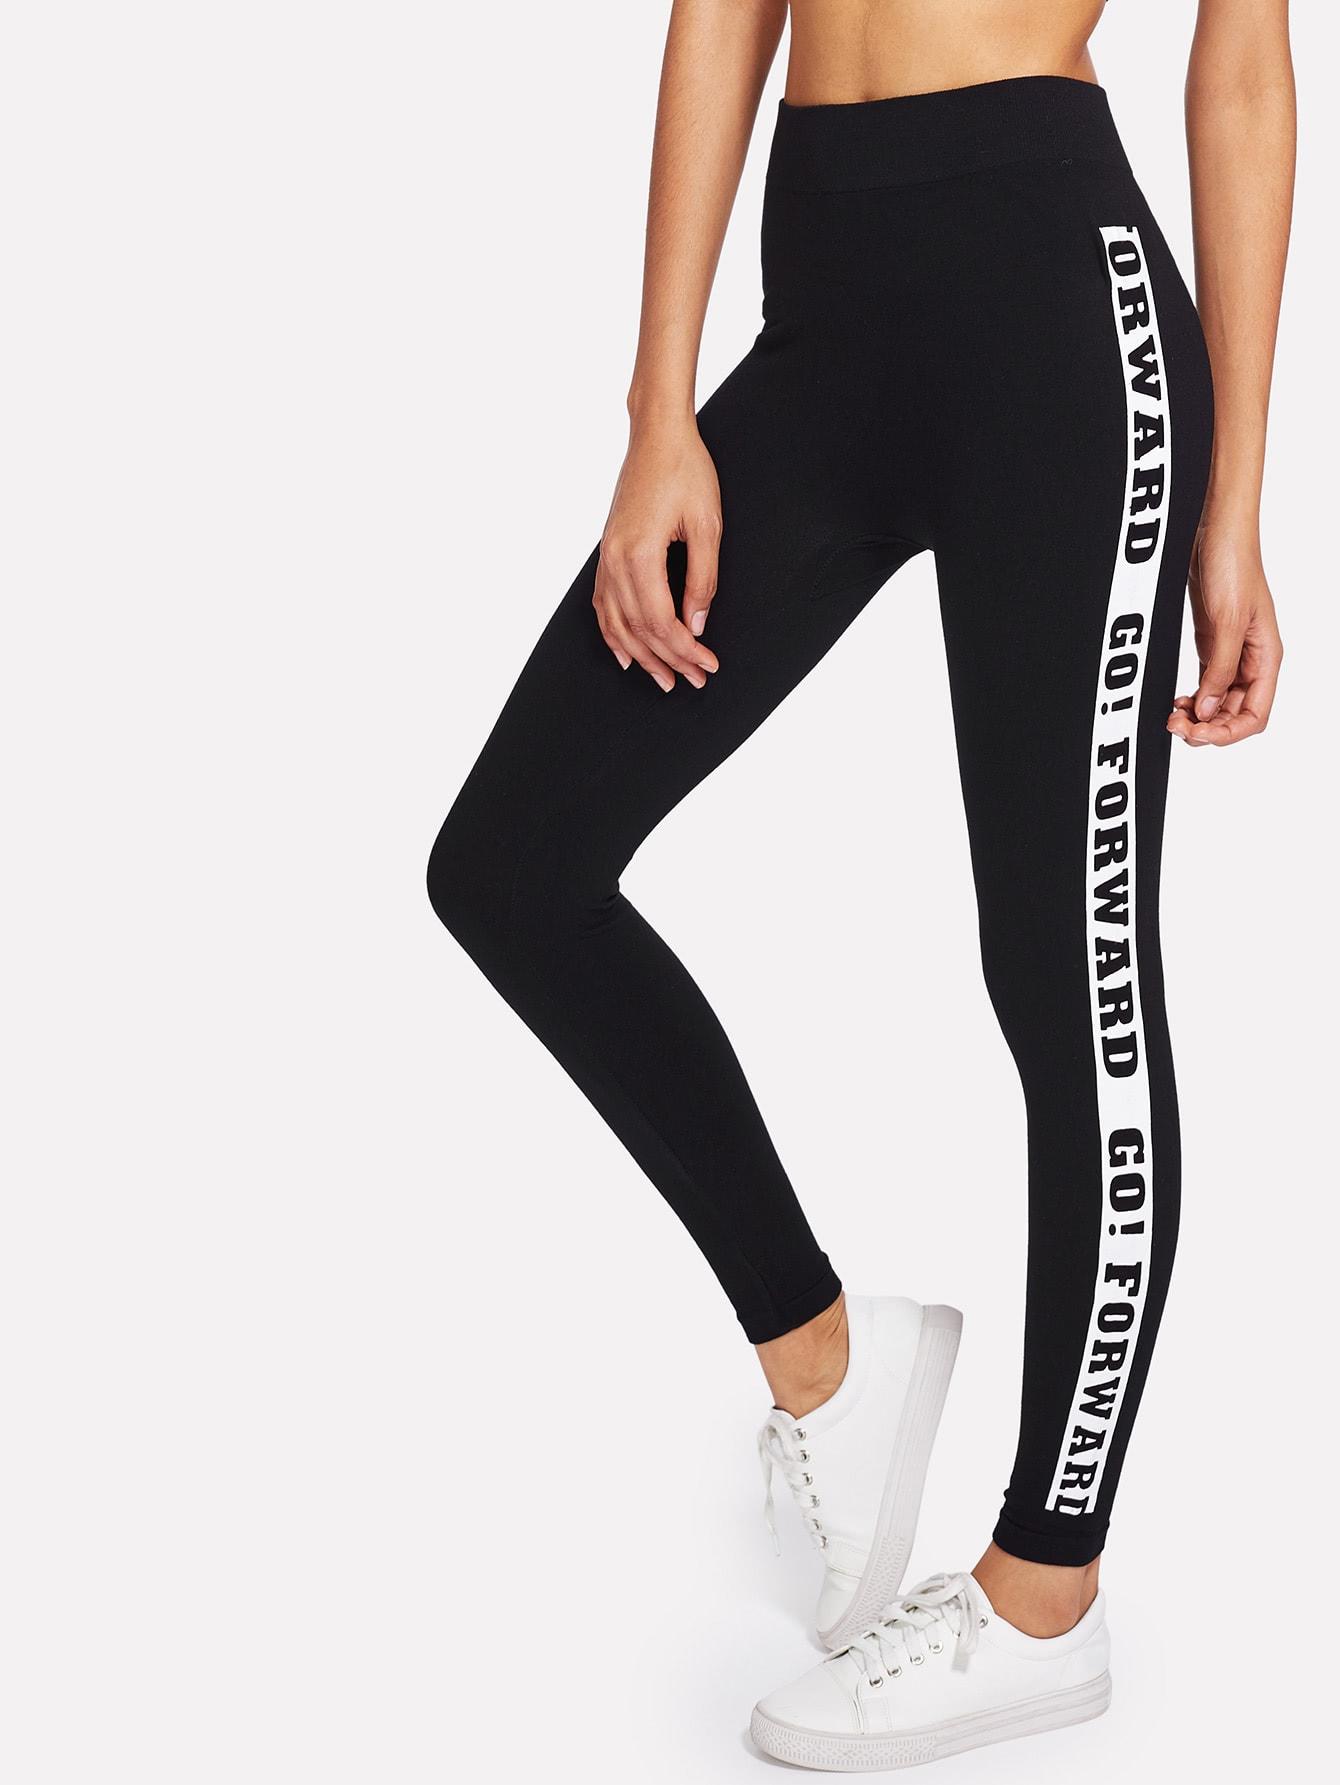 Slogan Print Side Skinny Leggings